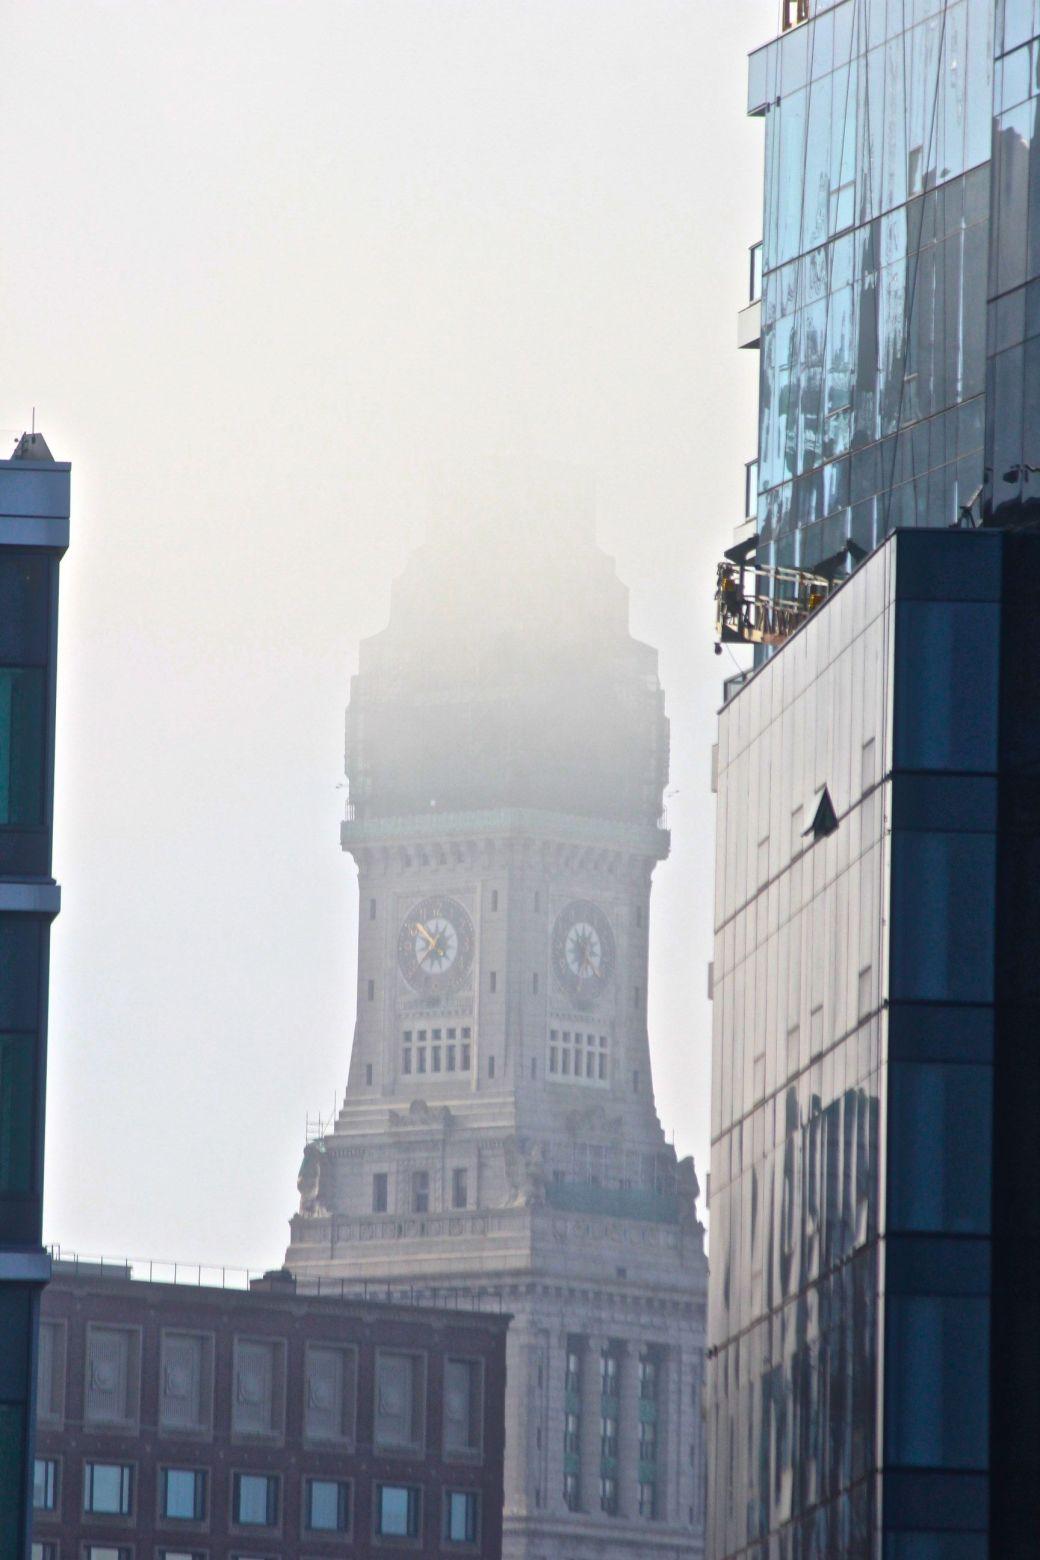 boston seaport district customs house tower fog